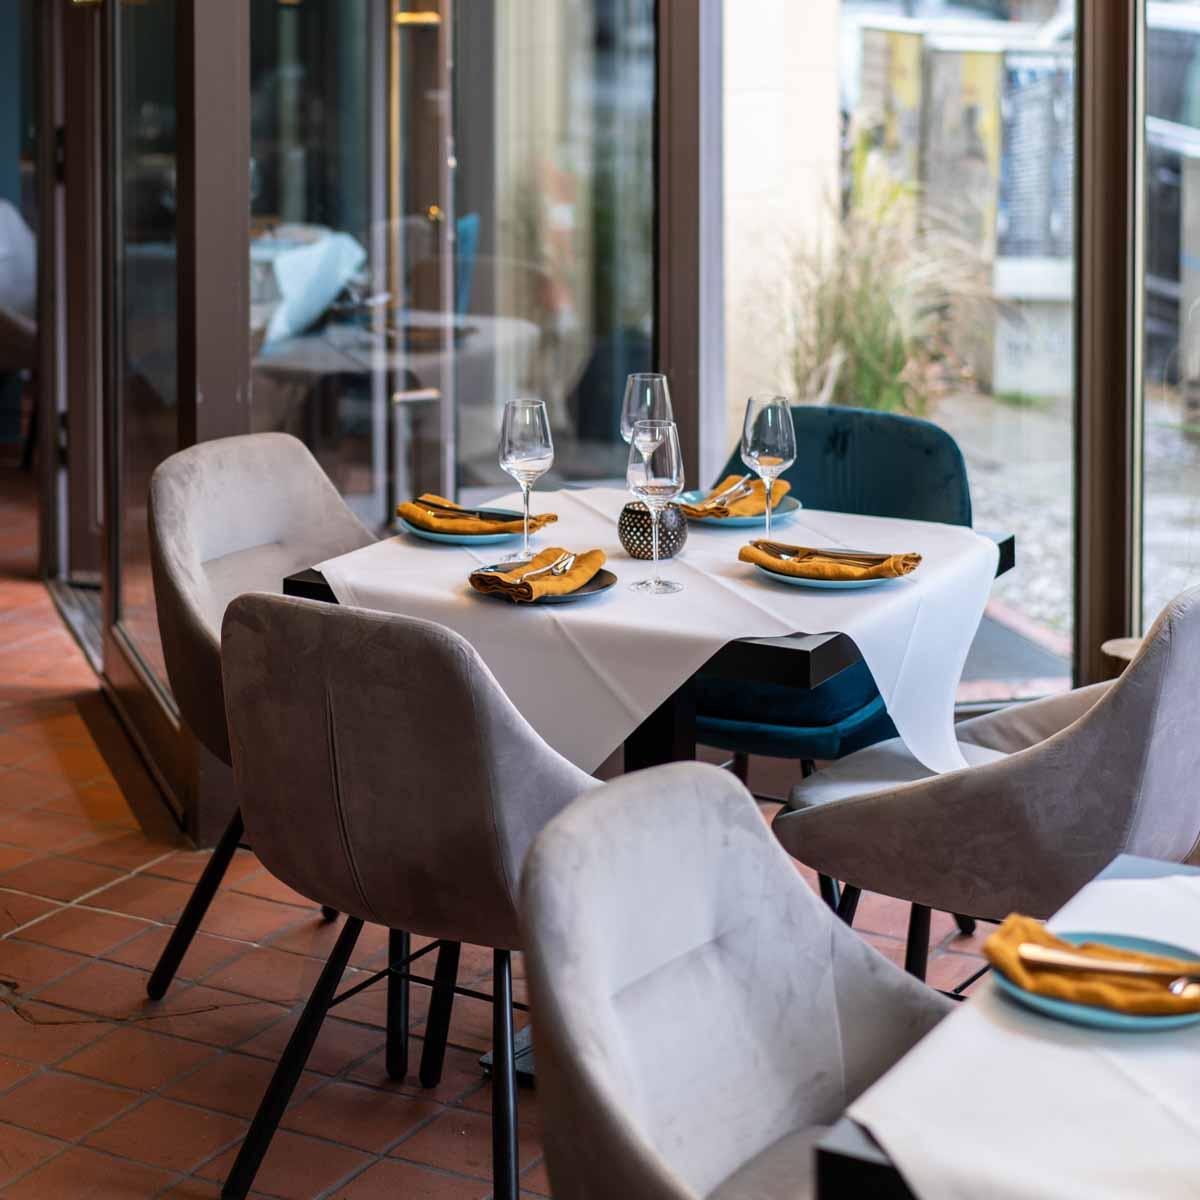 Restaurant Kreuz + Kümmel in Mitte © The Dude for Food-8